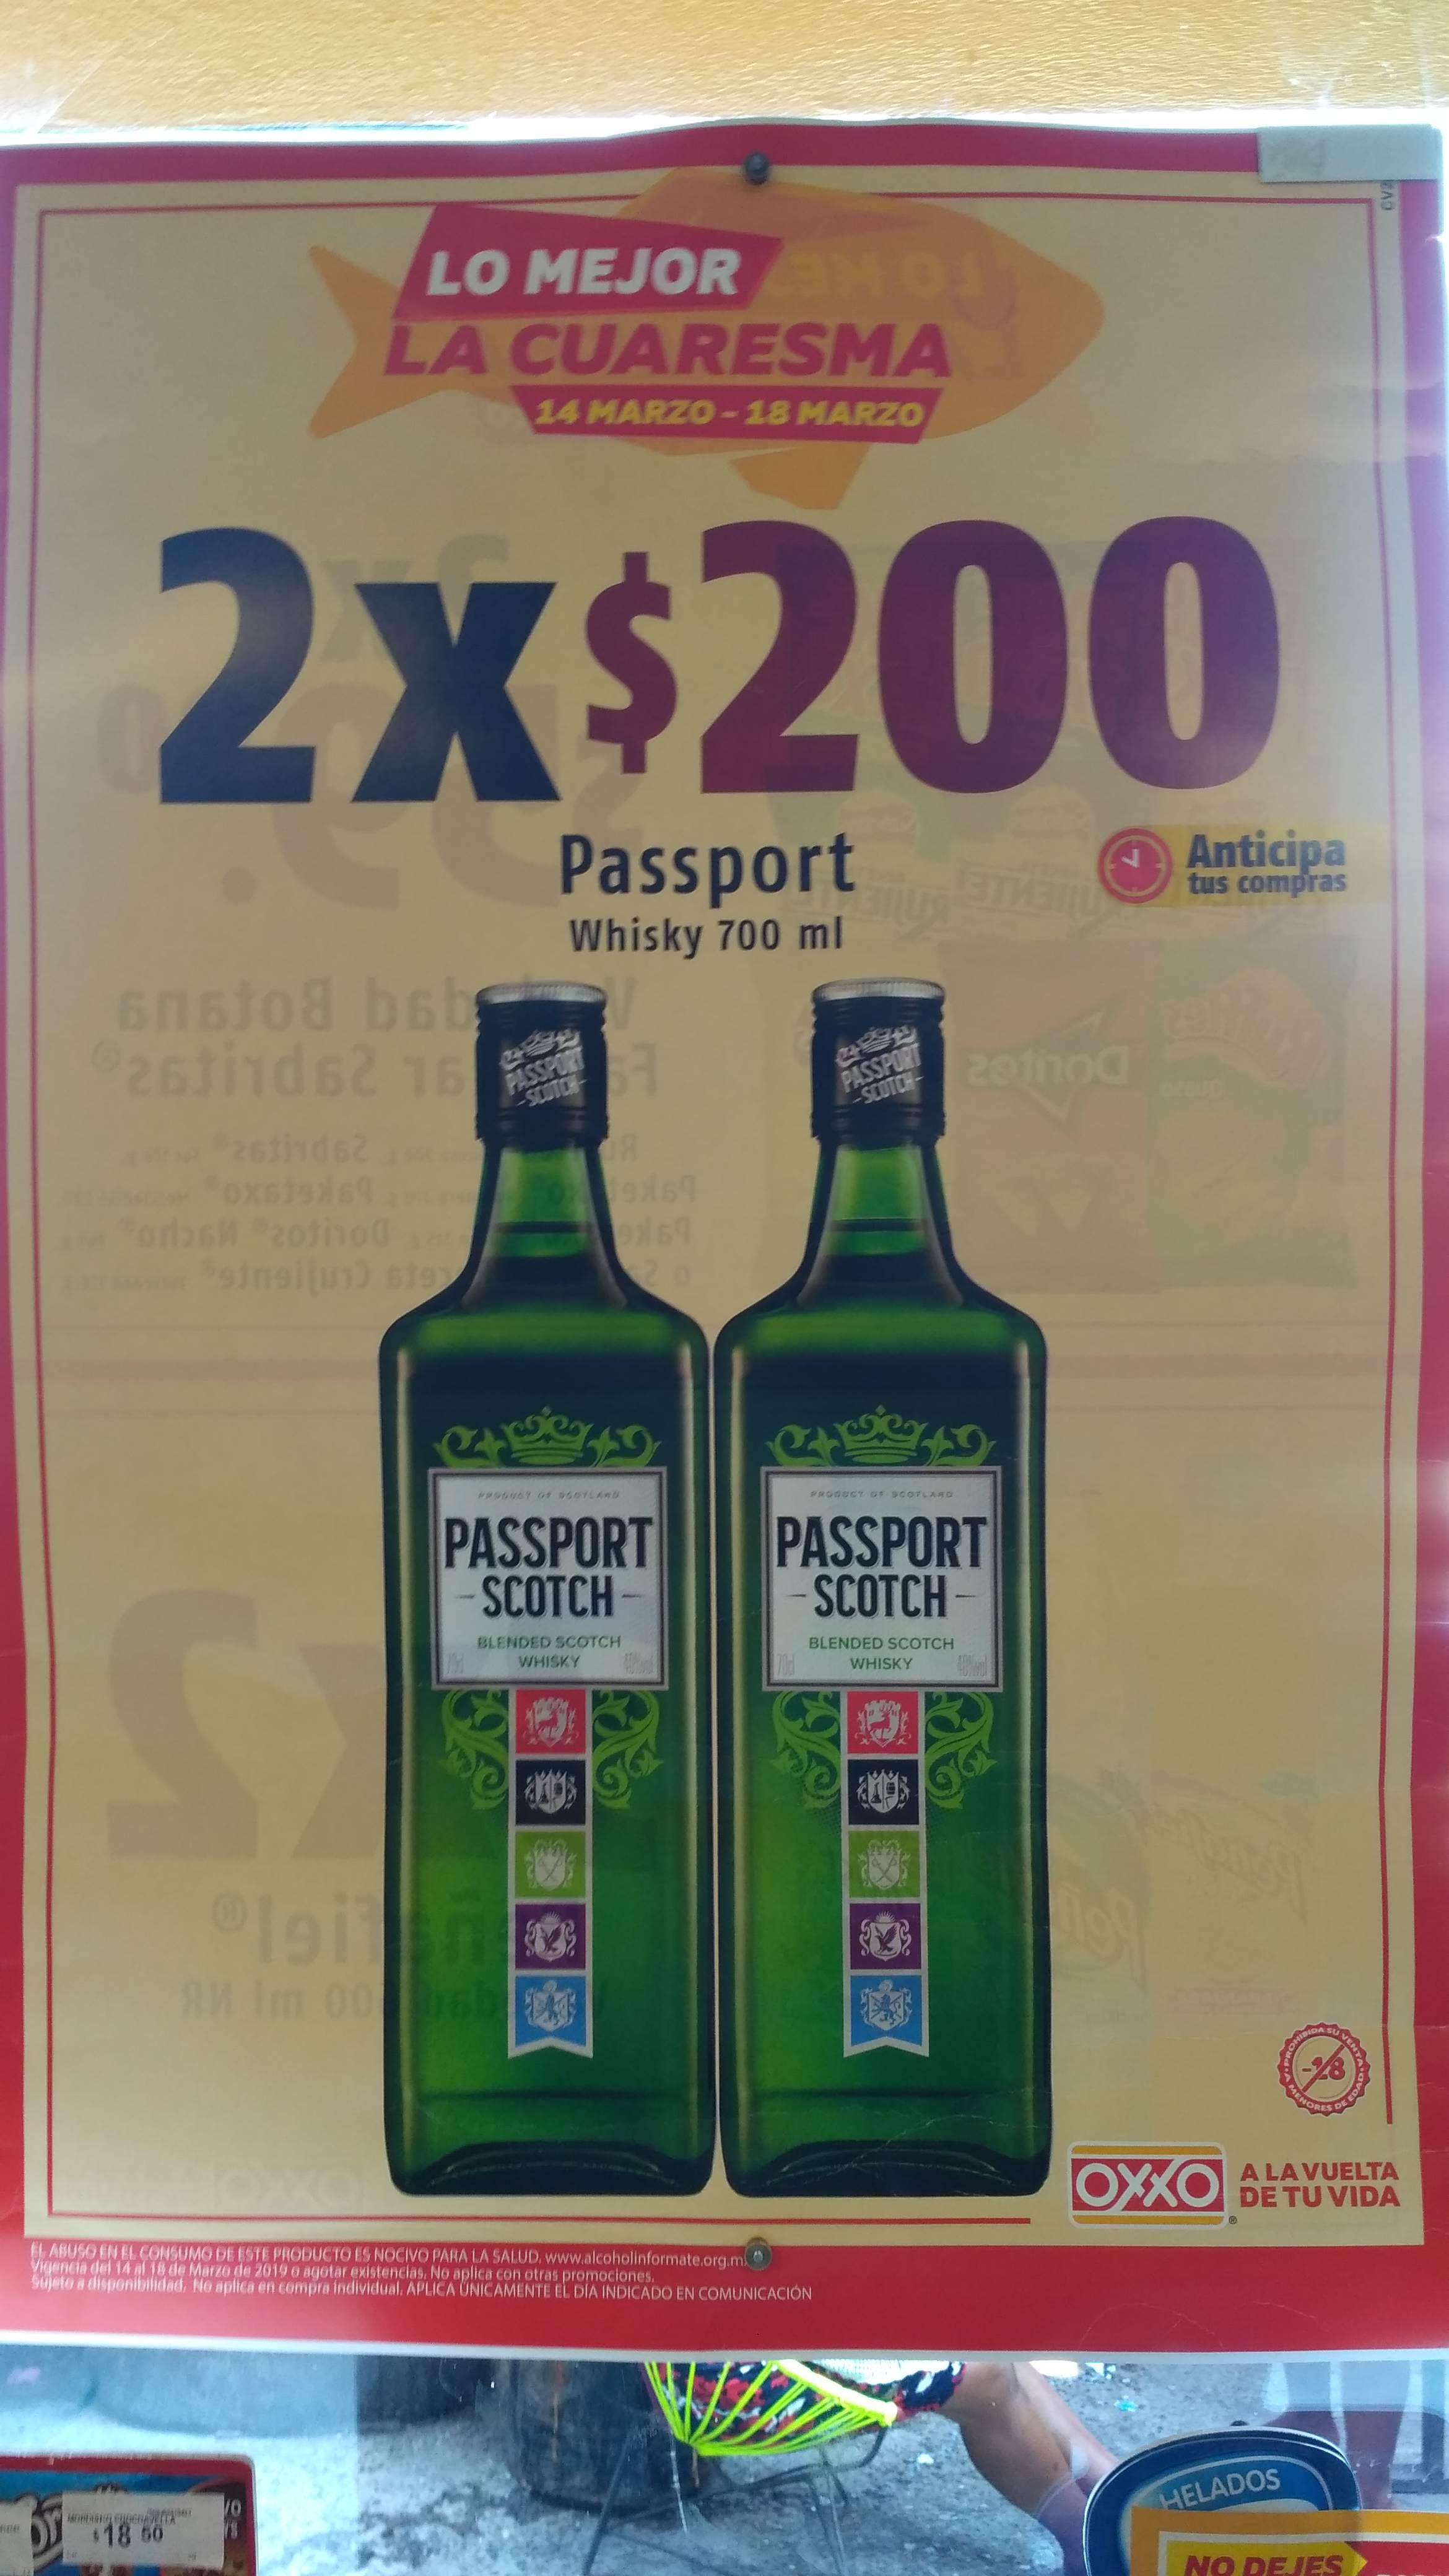 Oxxo: Whiskey Passport 700 ml 2 x 200